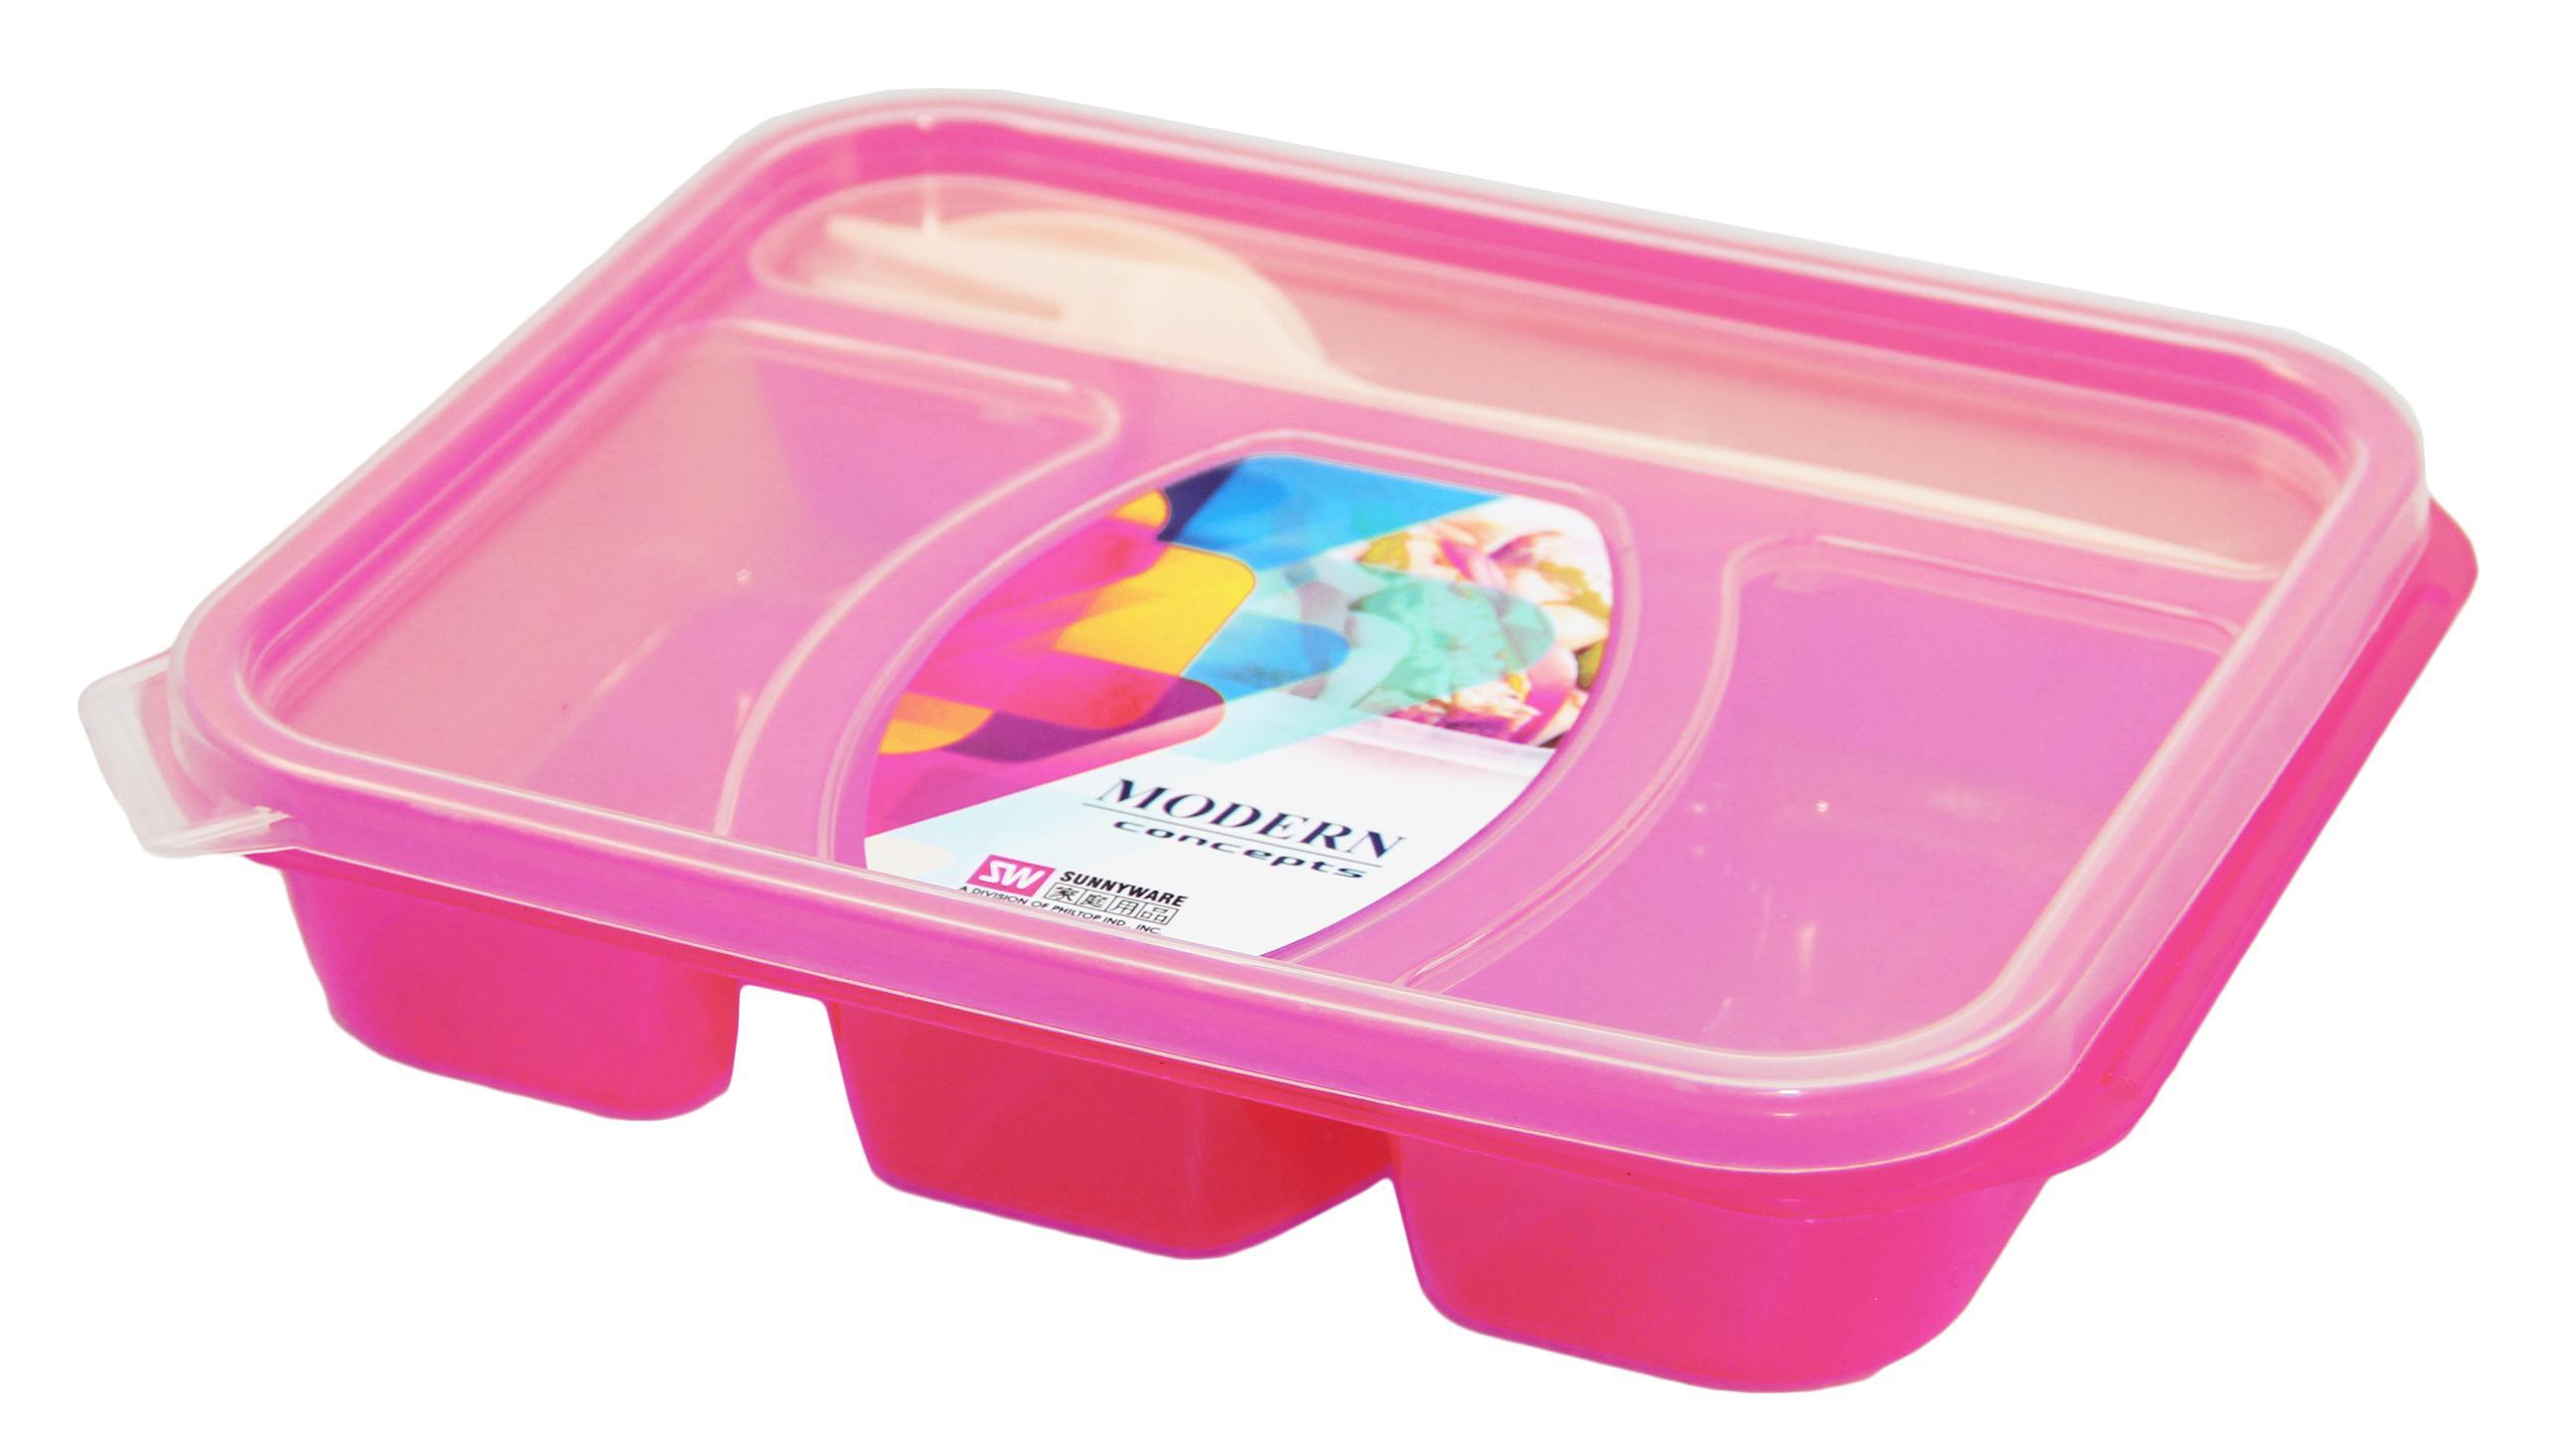 85326709c2f2 1pc Sunnyware 508 Bento Box /Lunch Box w/ Reusable Spoon & Fork